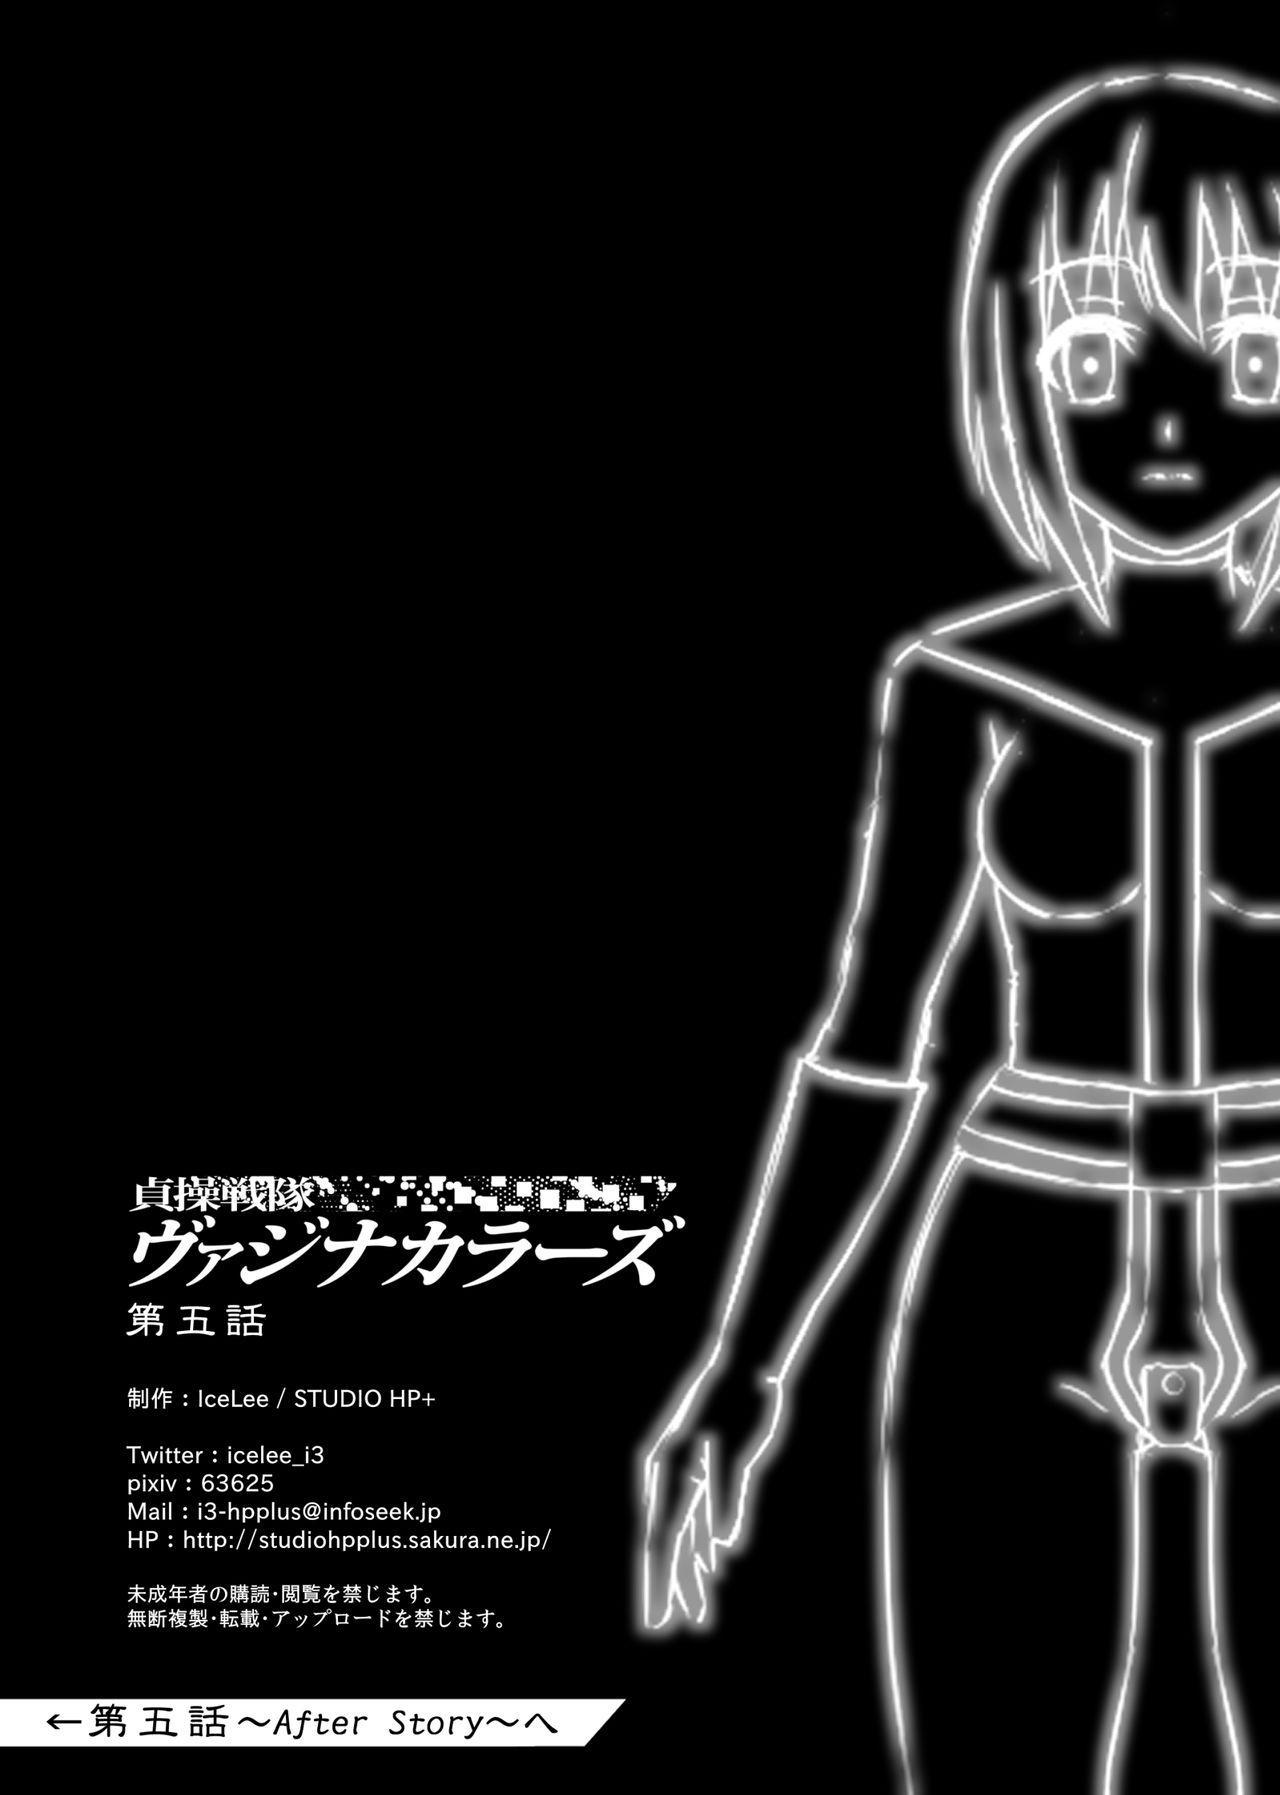 [STUDIO HP+ (IceLee)] Teisou Sentai Virginal Colors Dai-Go-wa 35